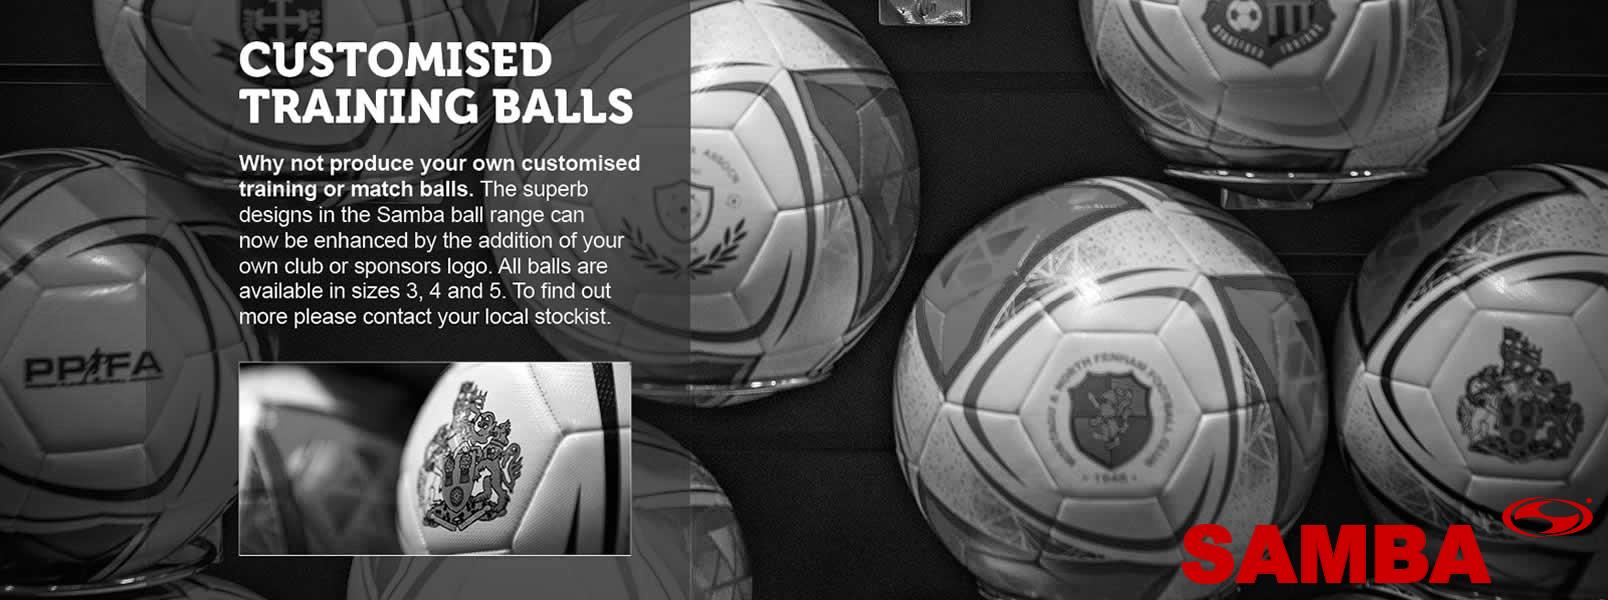 Samba customised training balls